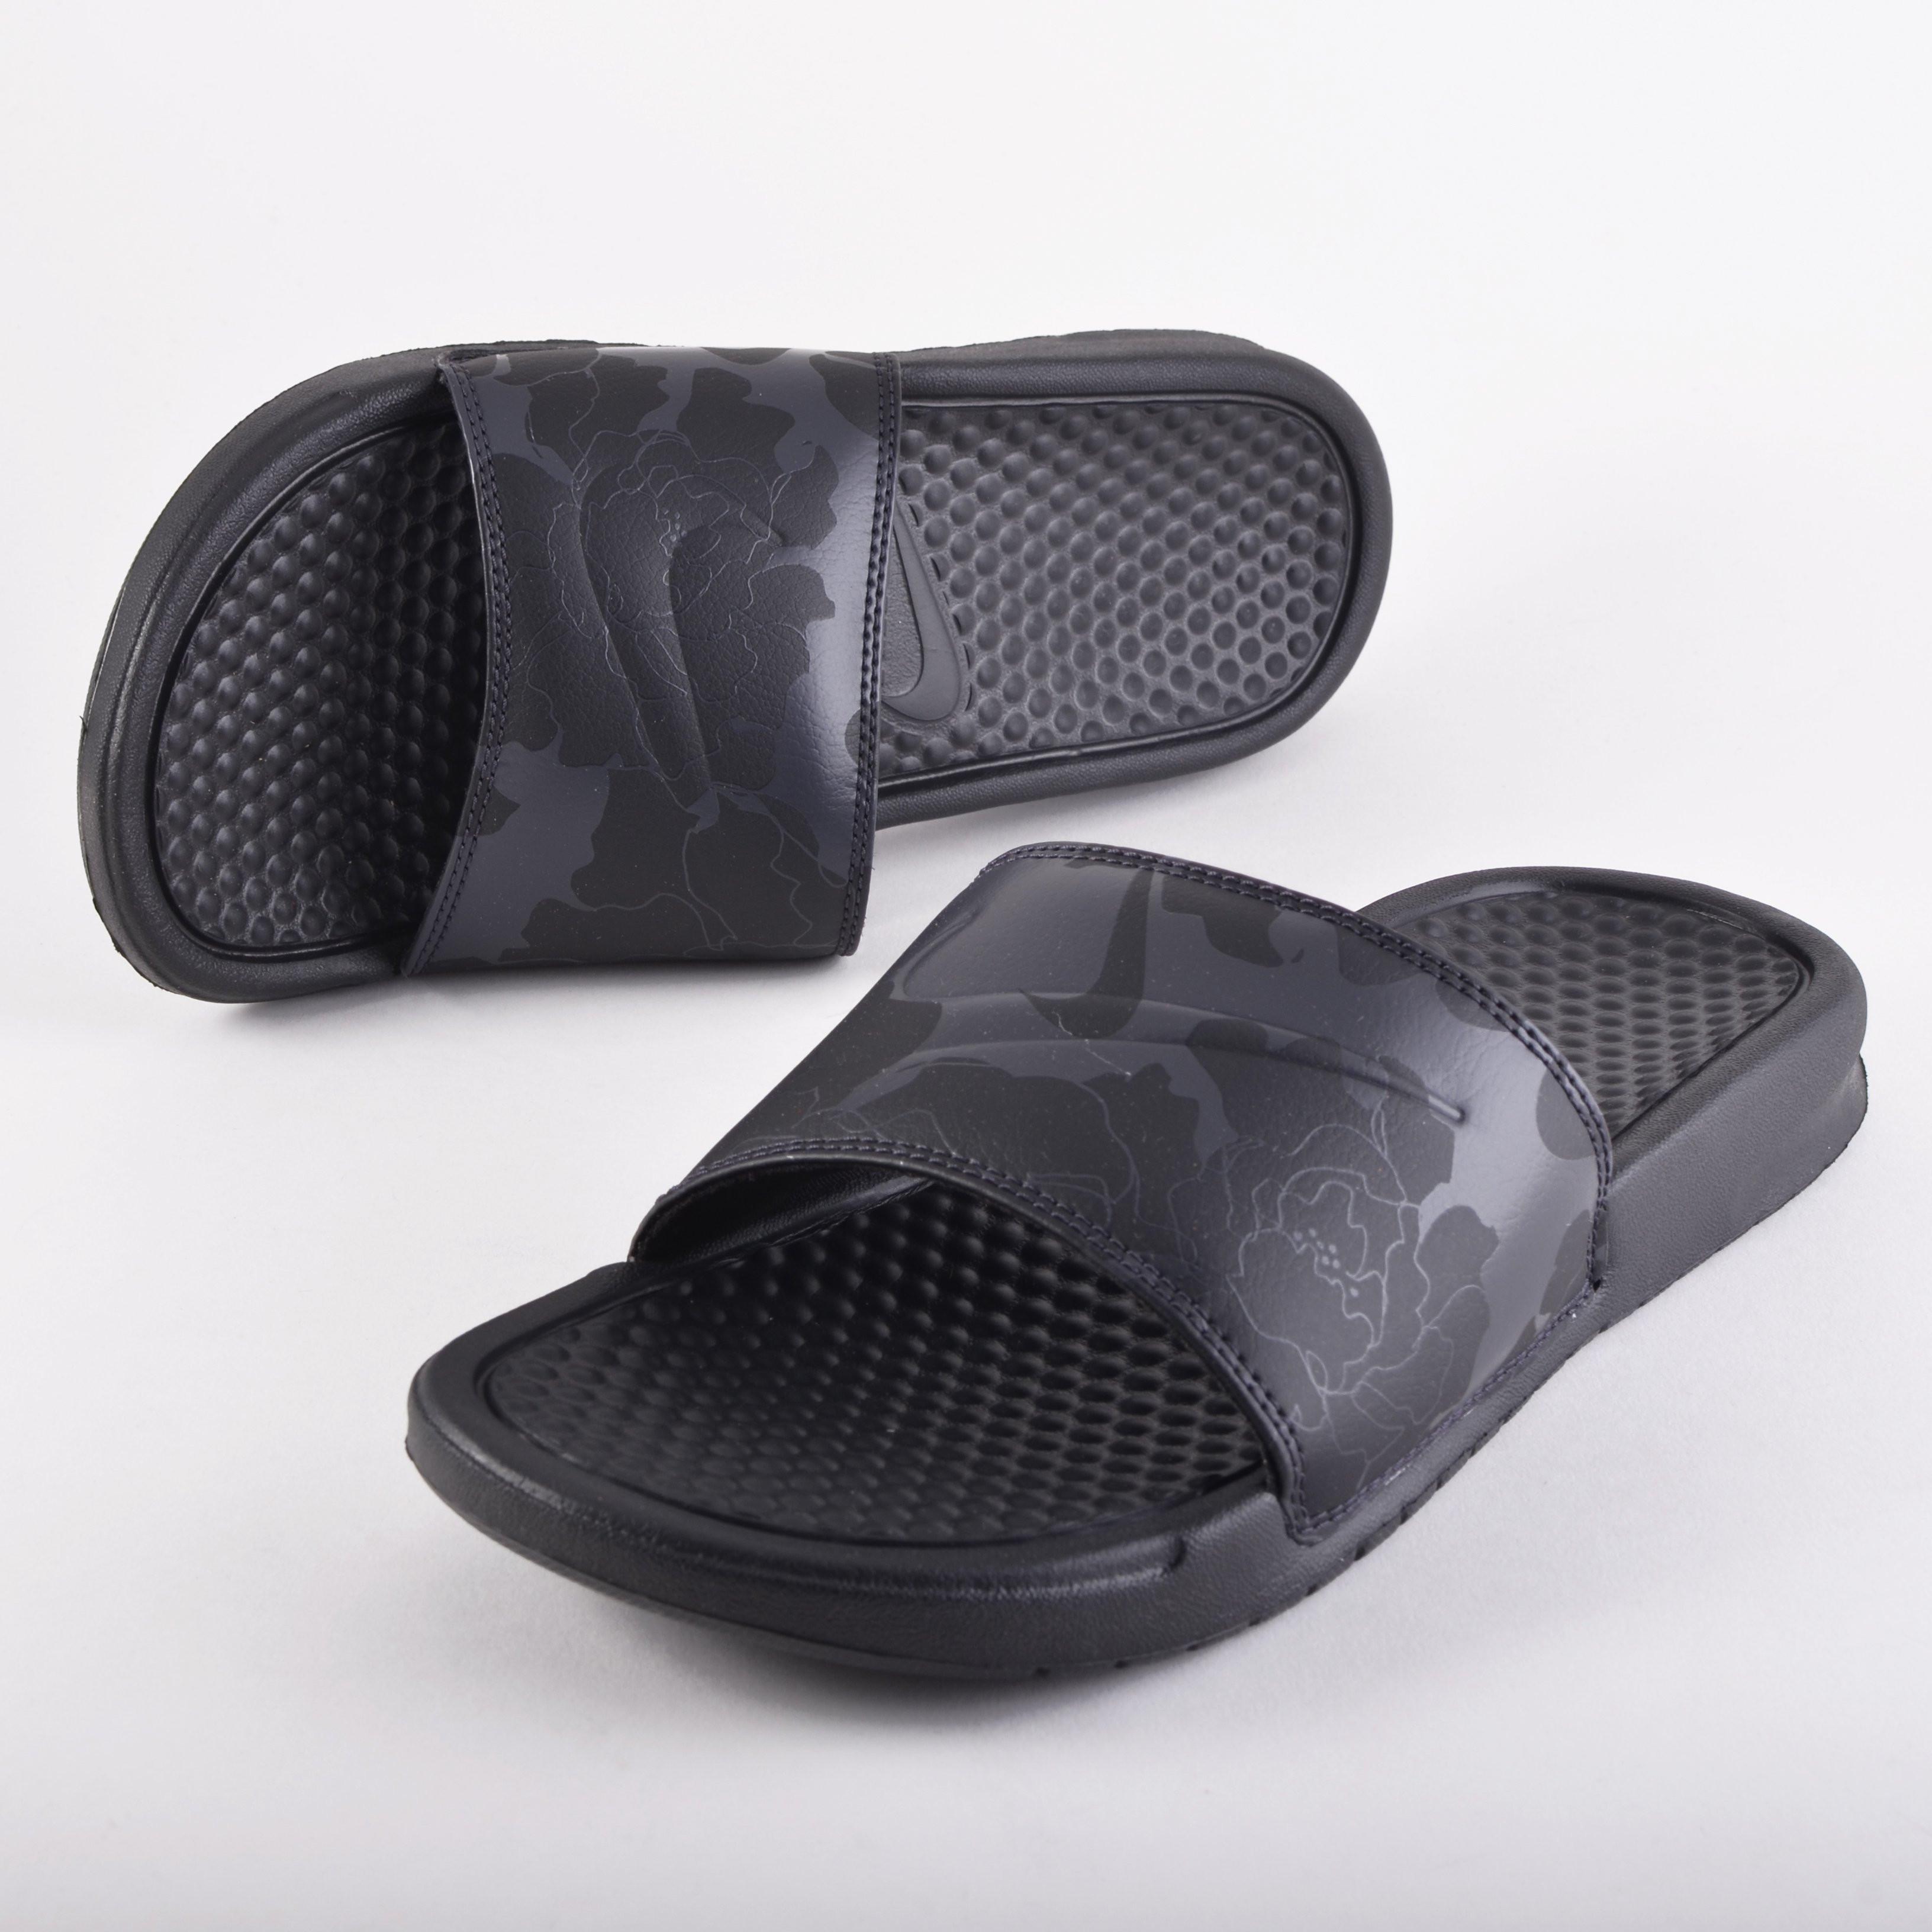 Nike Benassi | Γυναικείες Σαγιονάρες (9000030454_39100)